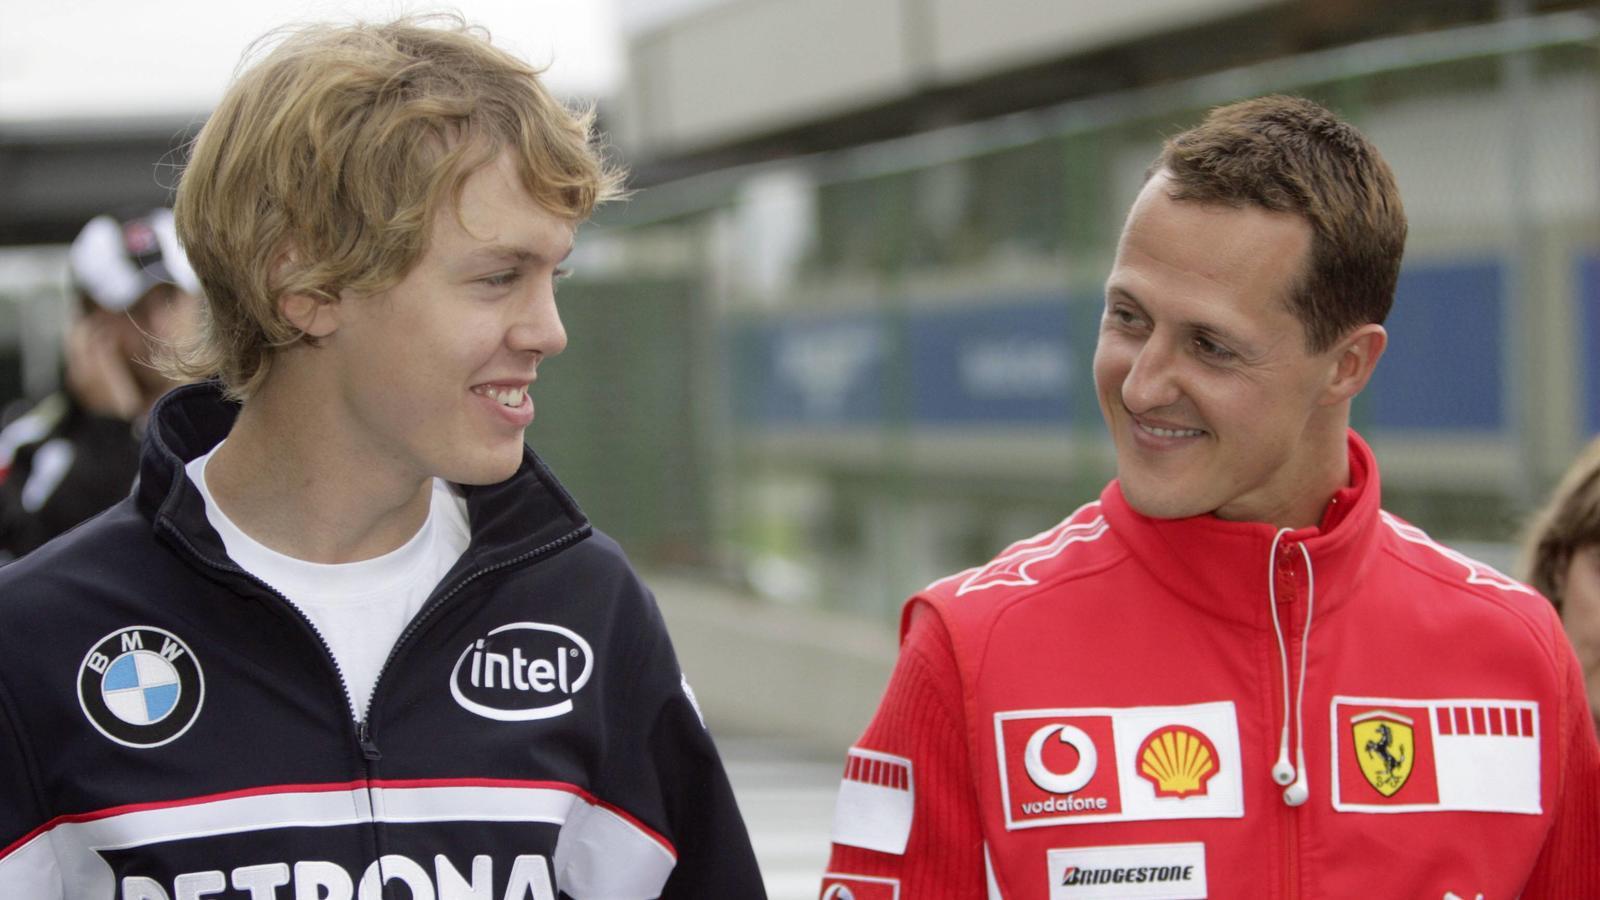 Wenn es nach Sebastian Vettel (l) geht, soll sich bei Ferrari Geschichte wiederholen